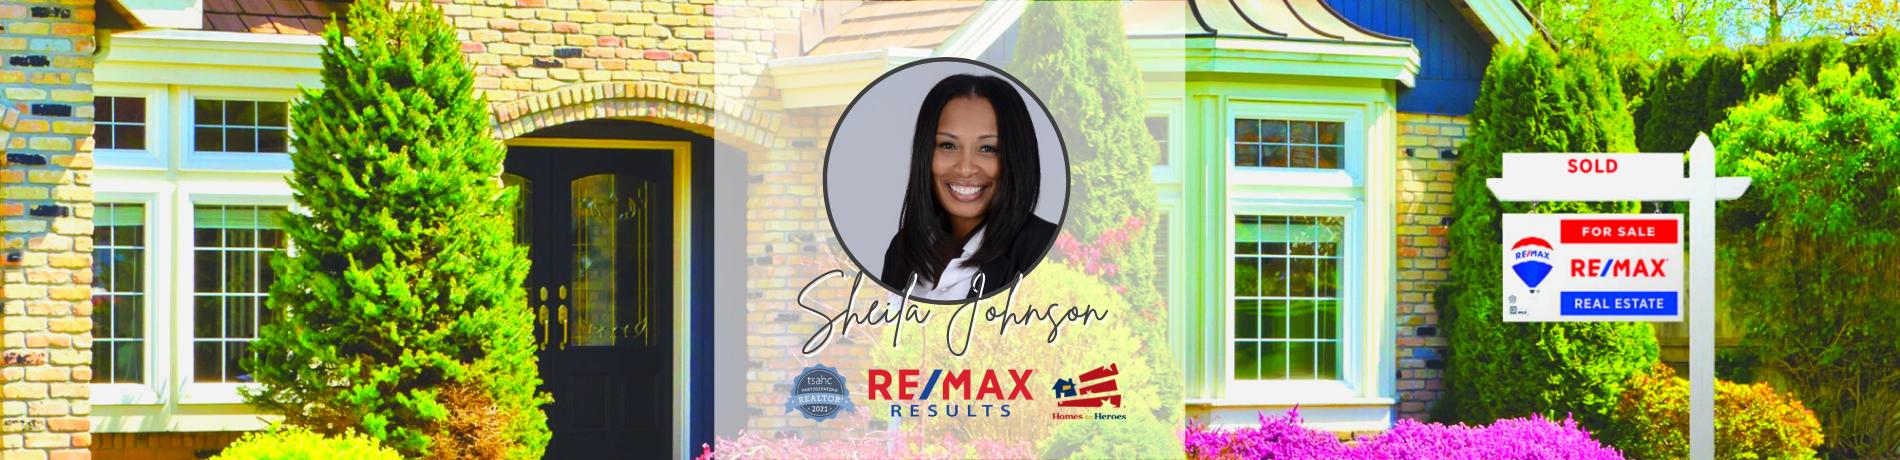 Sheila Johnson - remax